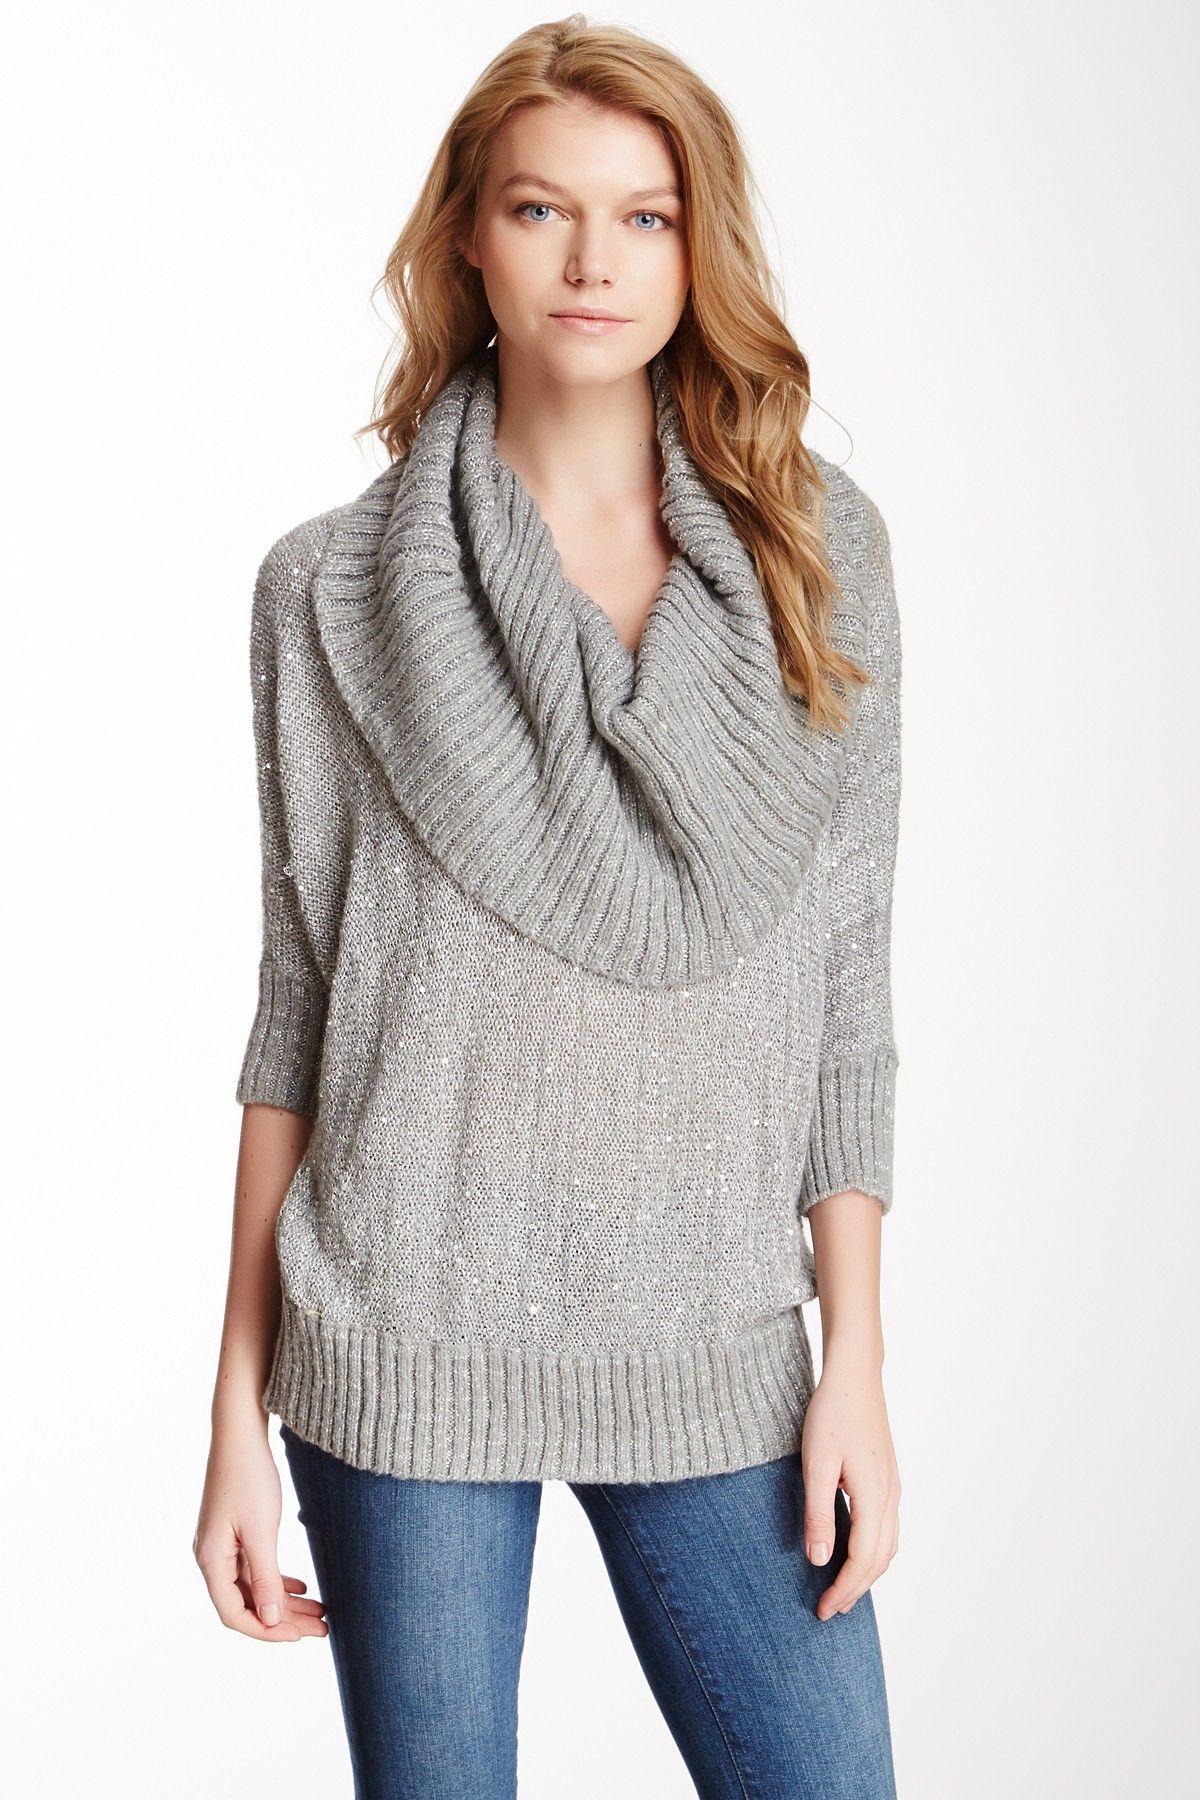 Large Cowl Neck Sweater | Clothes | Pinterest | Cowl neck, Clothes ...